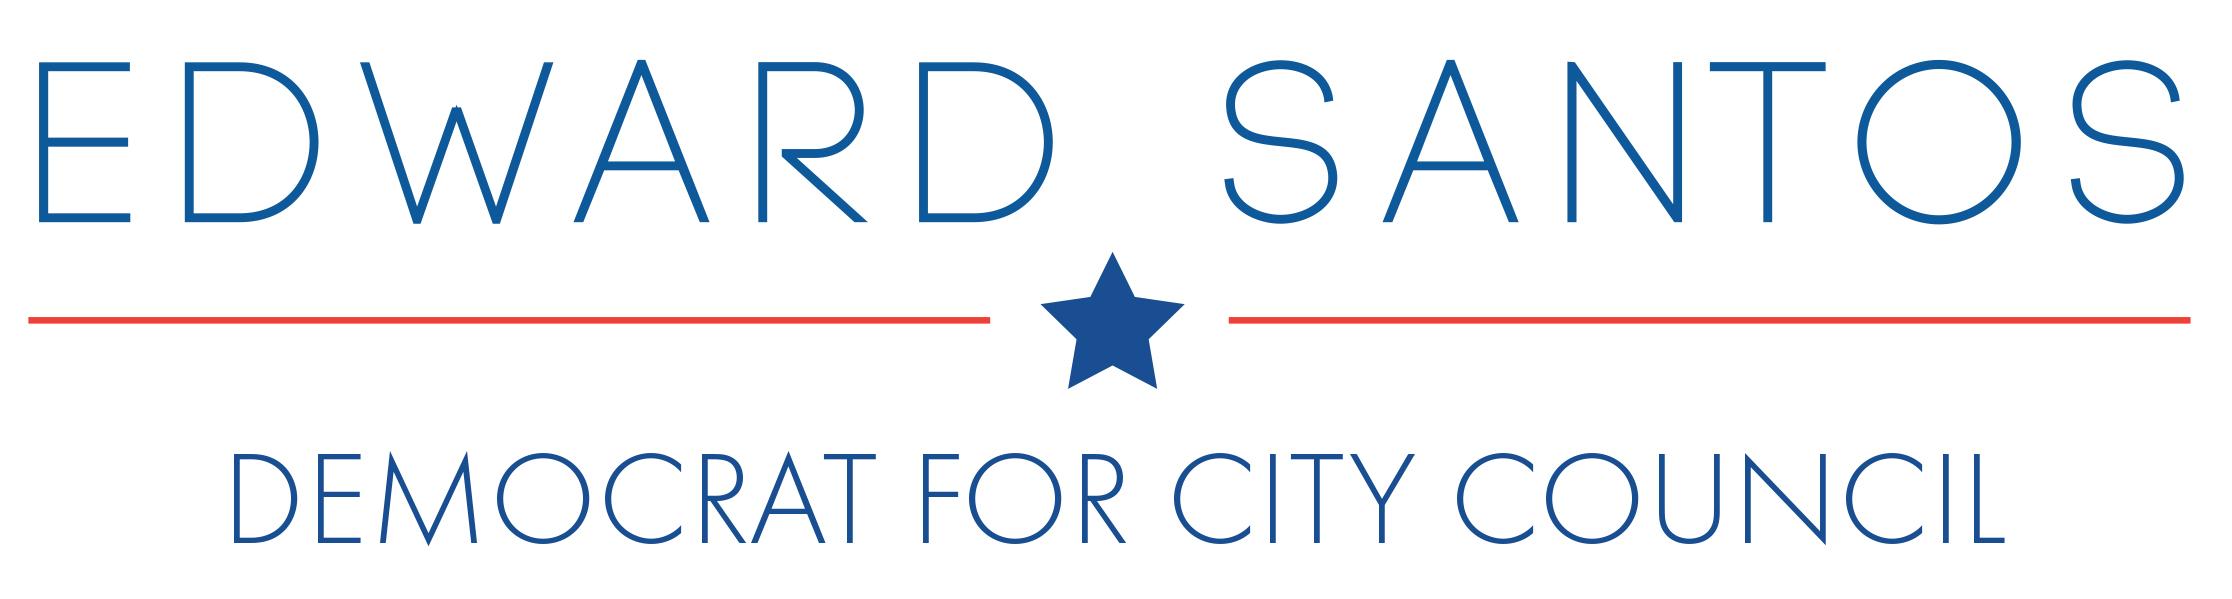 Logo-EdwardSantos2017-final.jpg